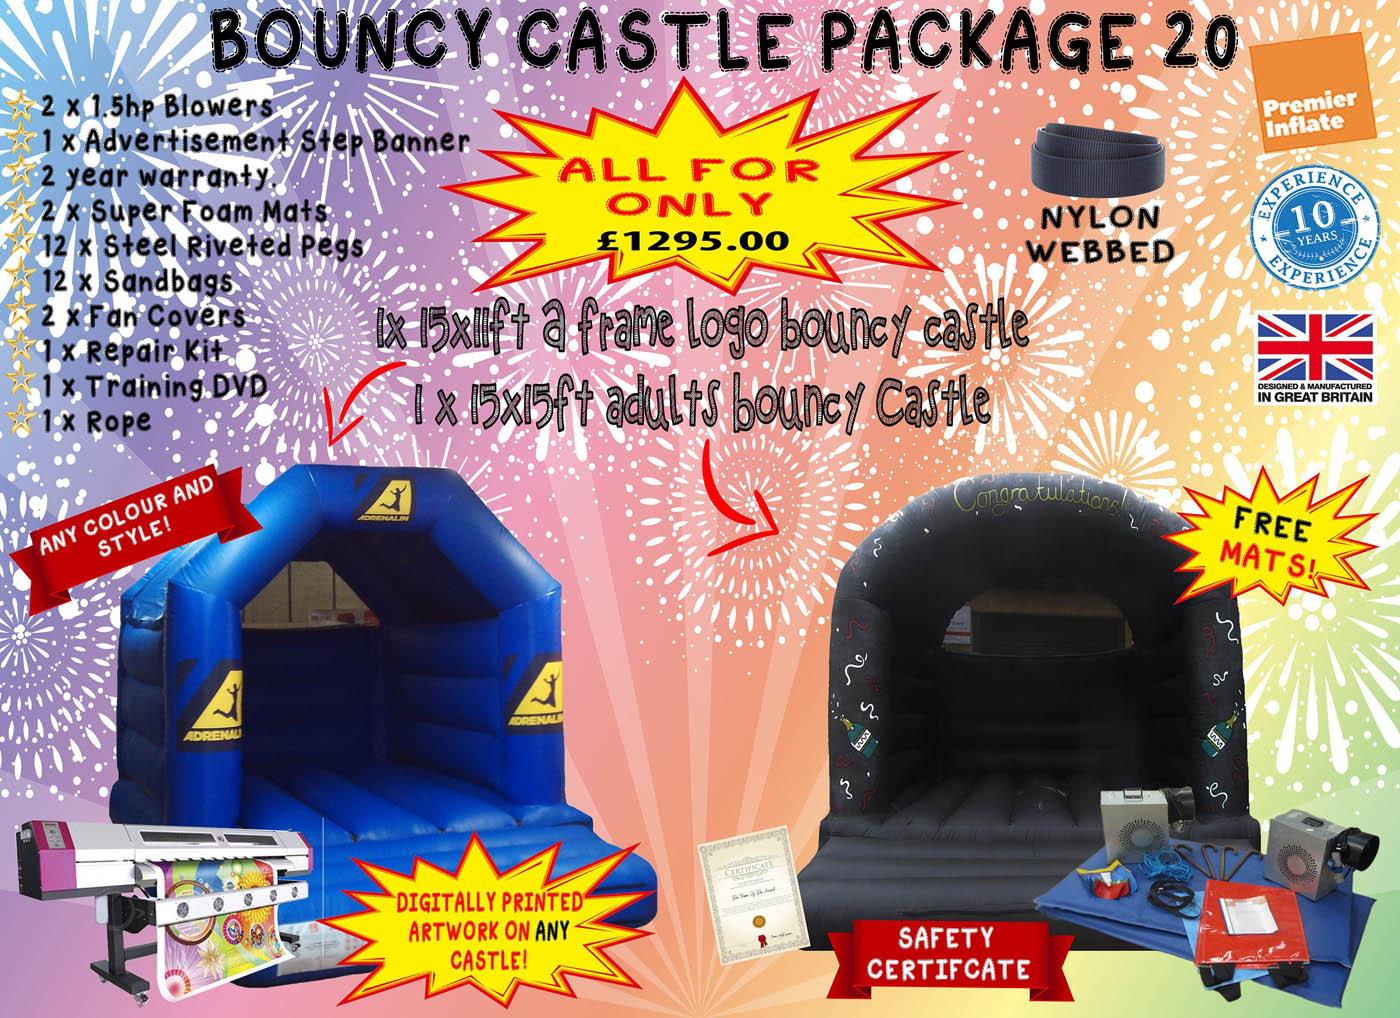 17x15-bouncy-castle-printed-logo-package-20-compressor